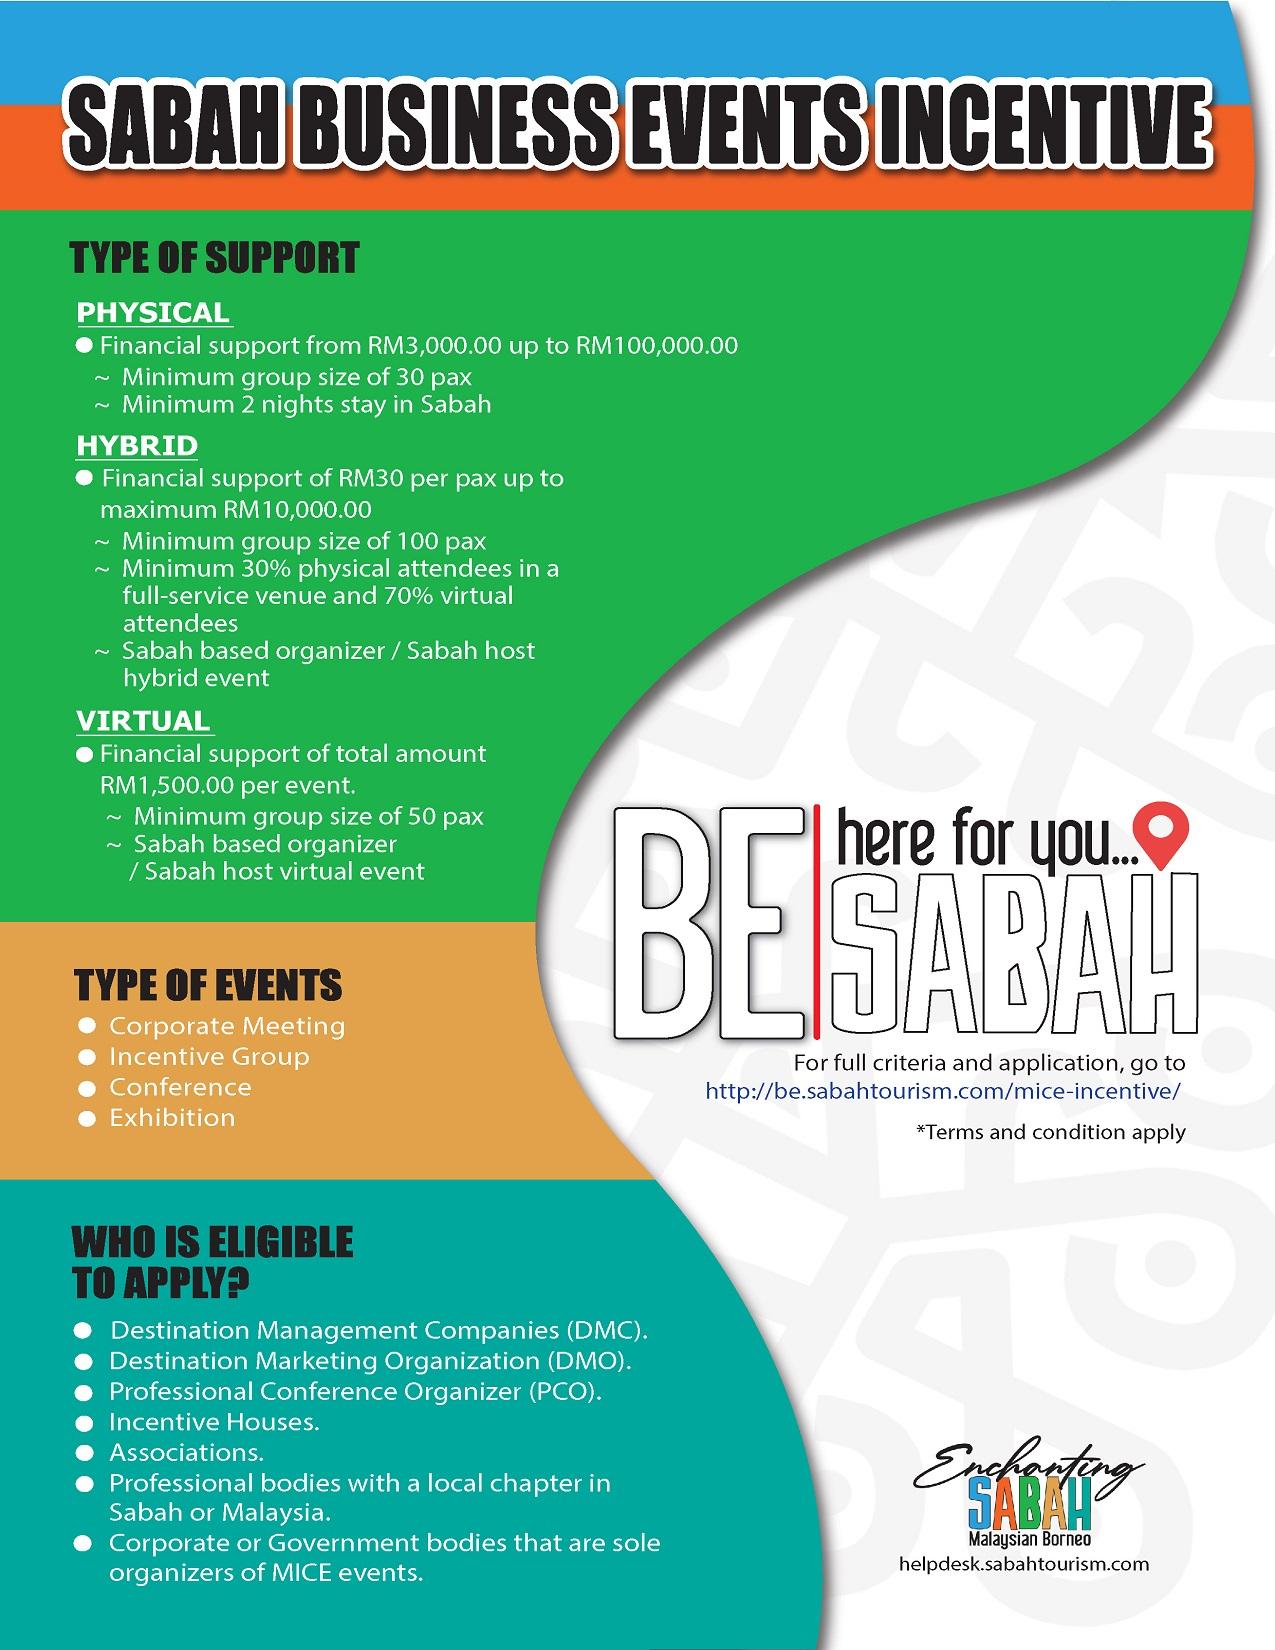 Sabah Business Events Incentive